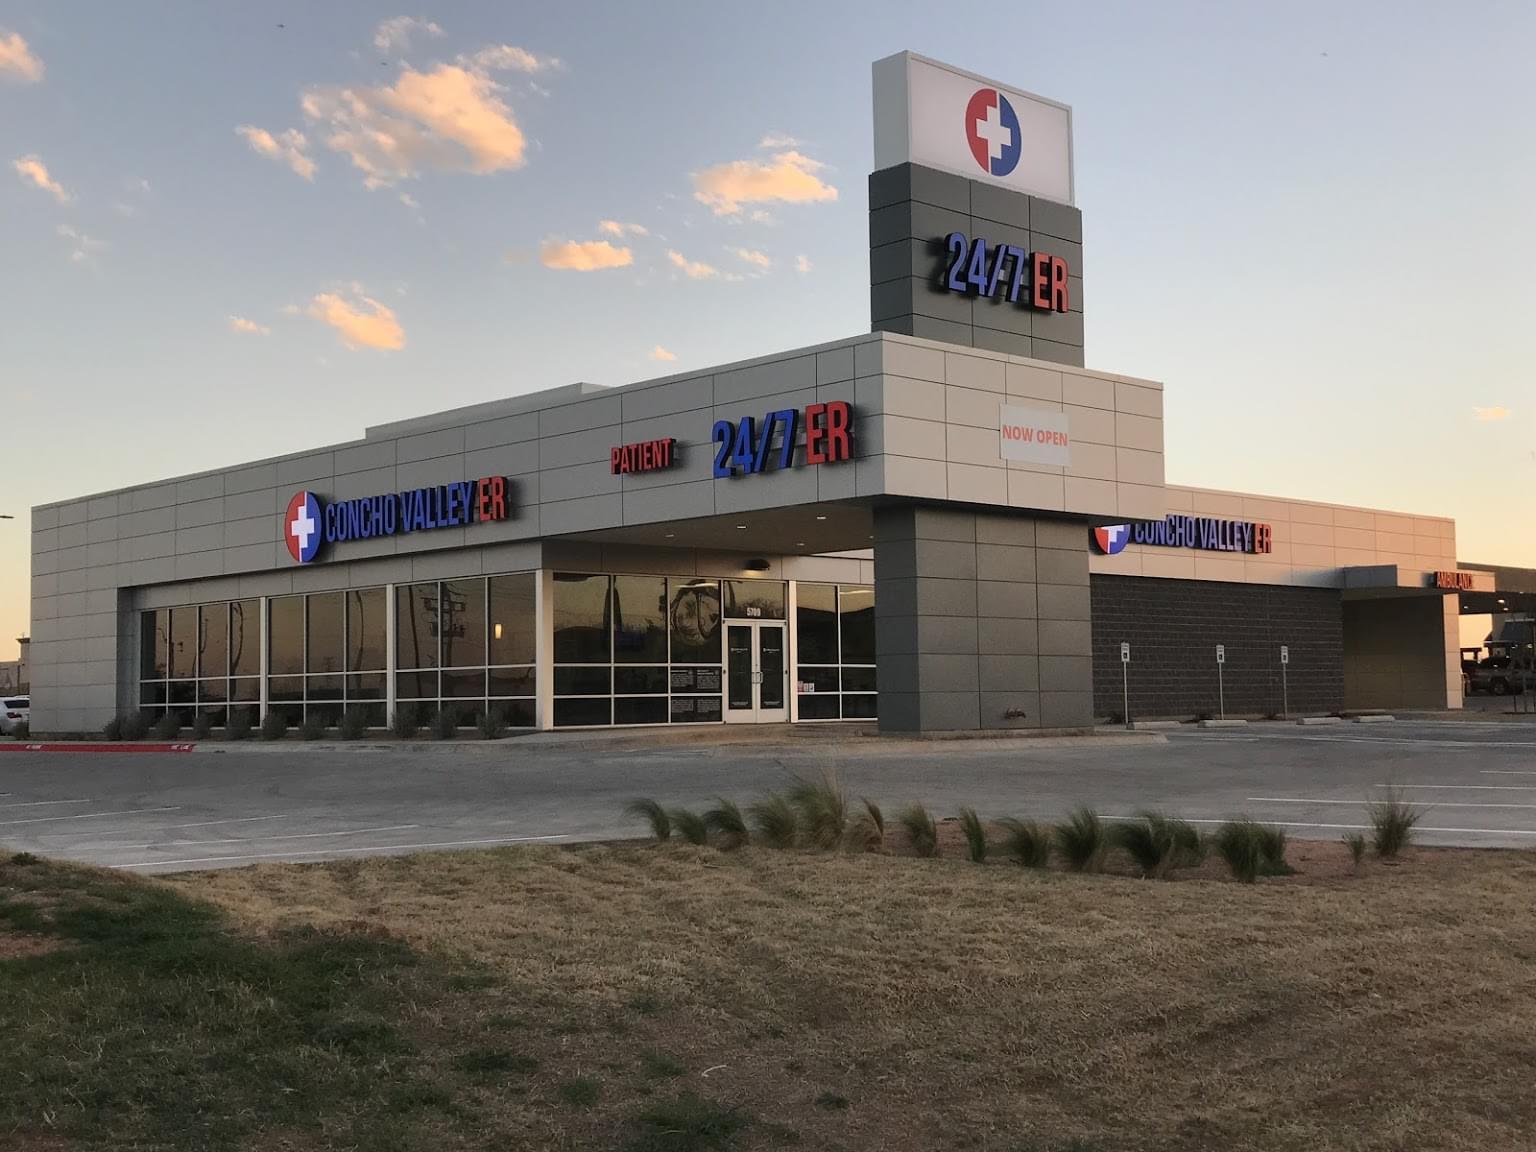 Concho Valley ER 24 7 Emergency Center San Angelo, TX exterior sunset